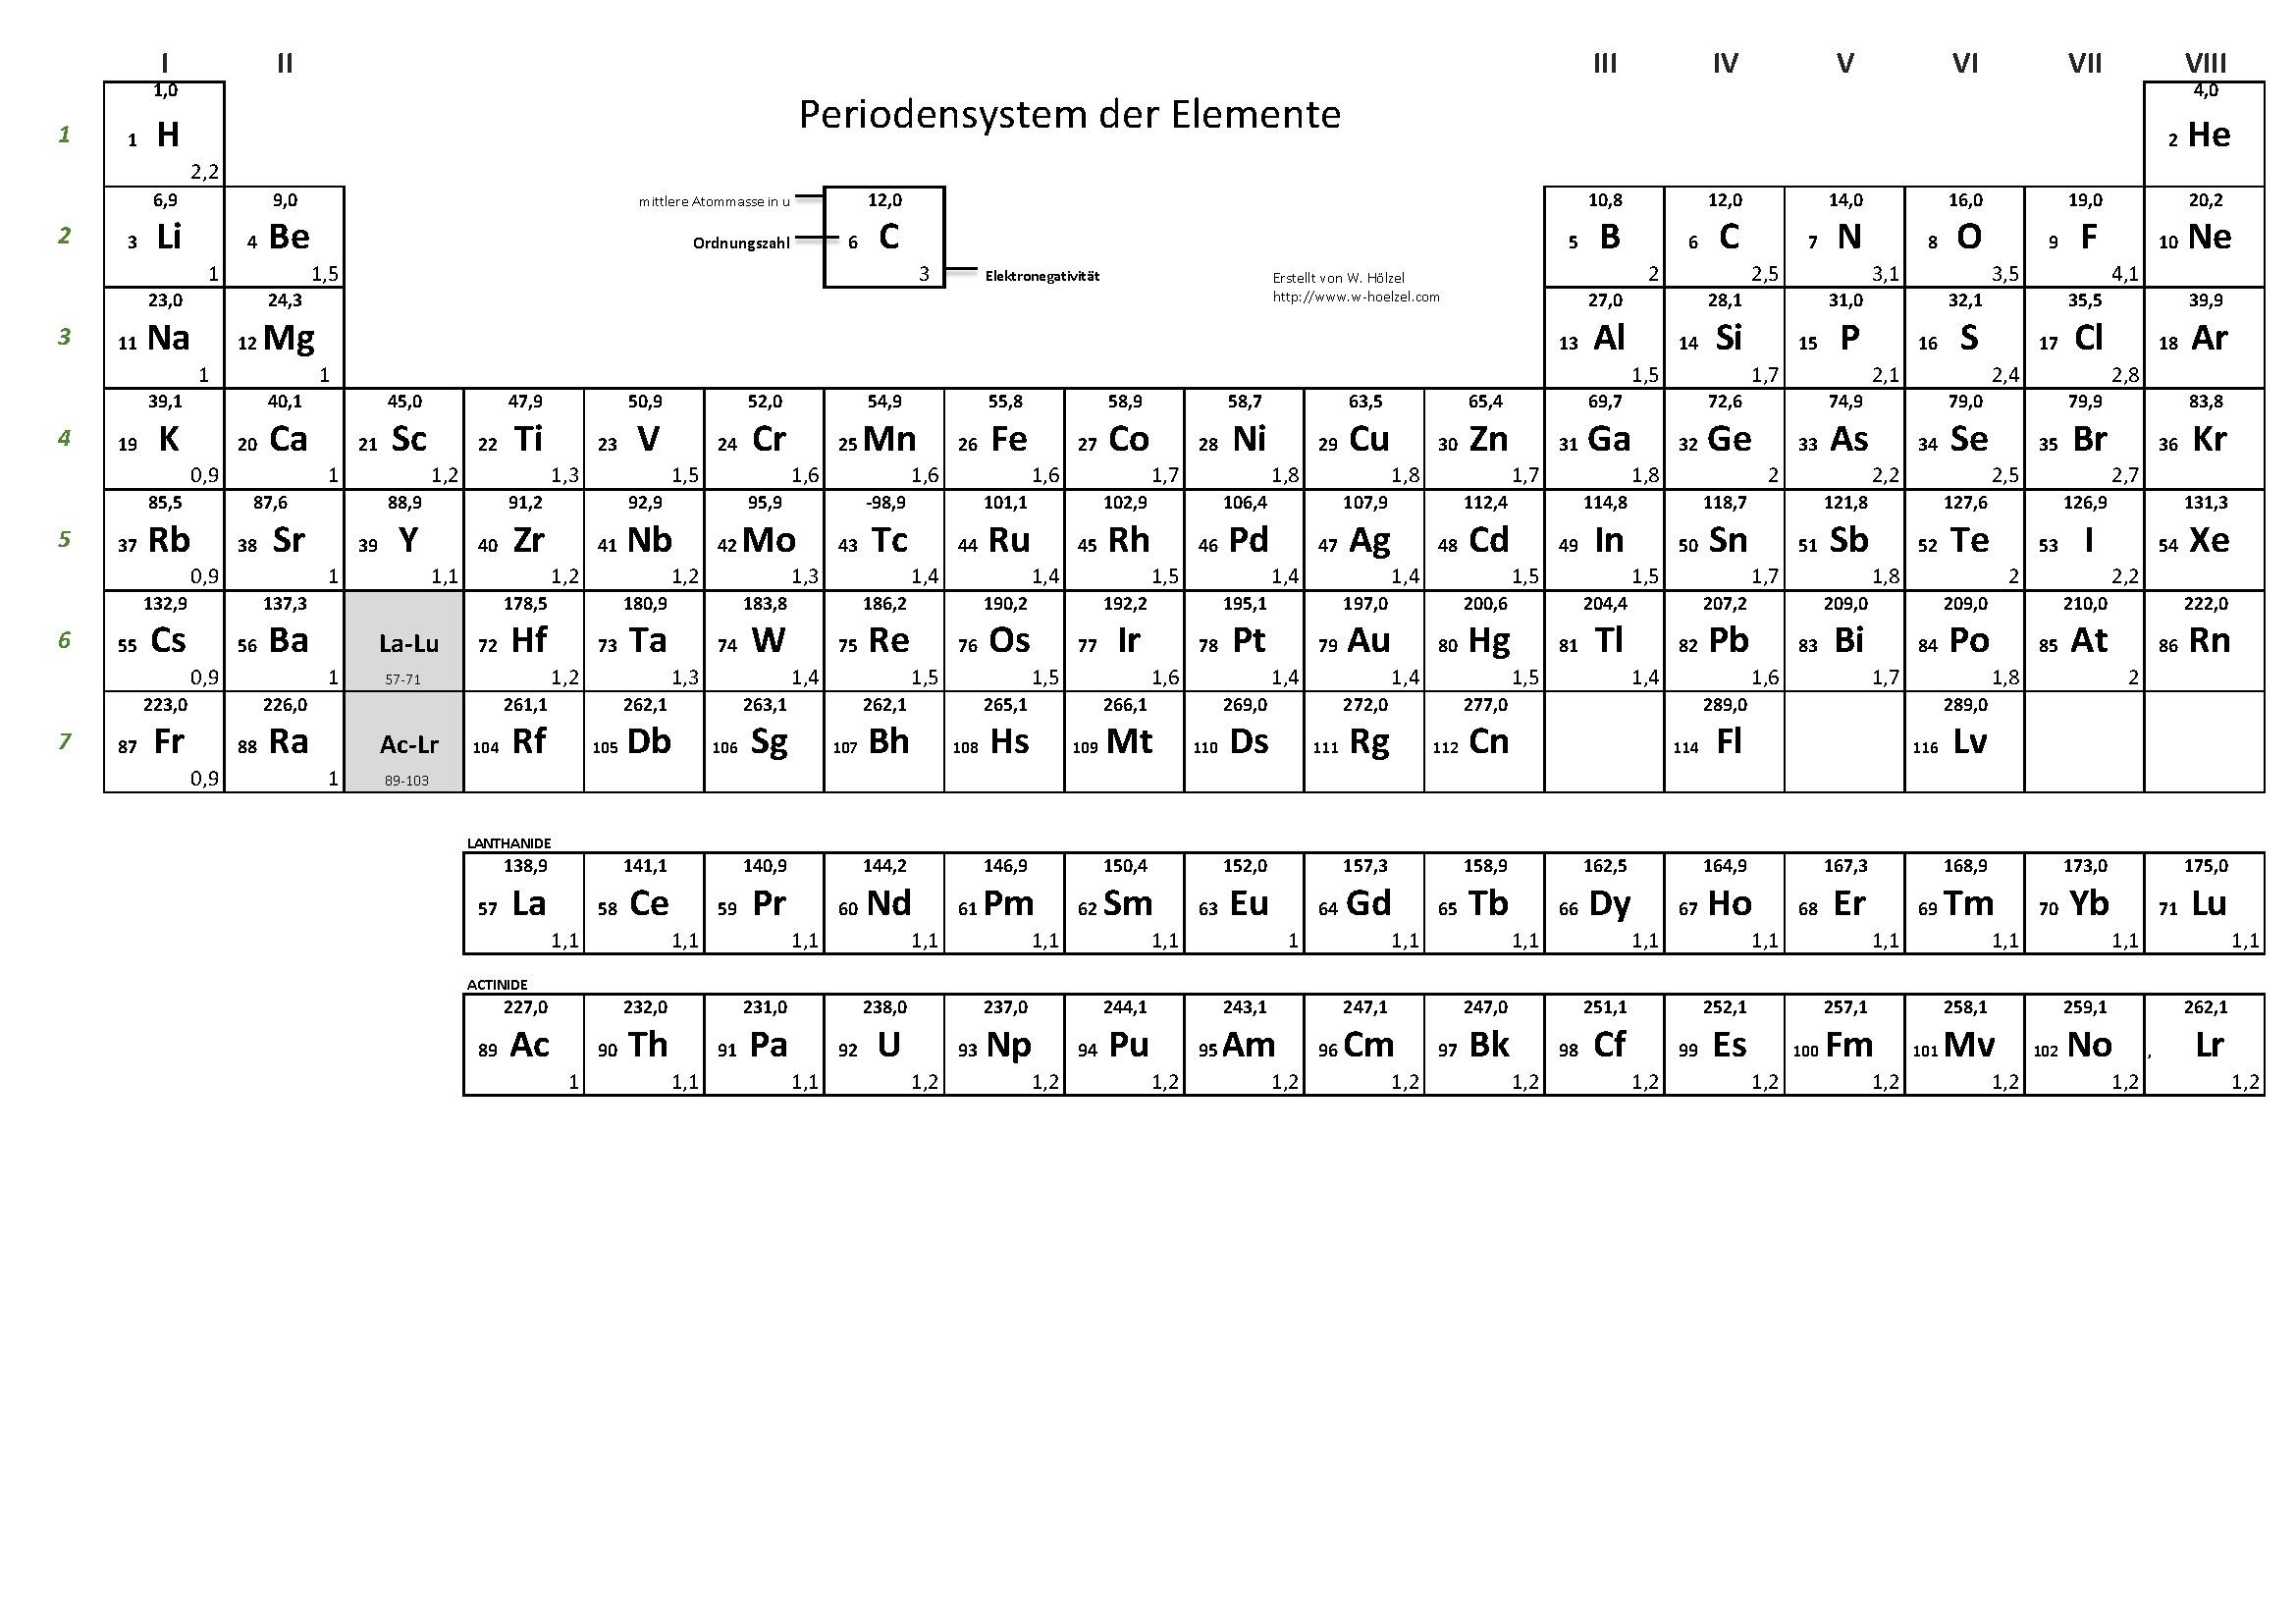 Erfreut Periodensystem Ãœbung Arbeitsblatt Bilder - Mathe ...